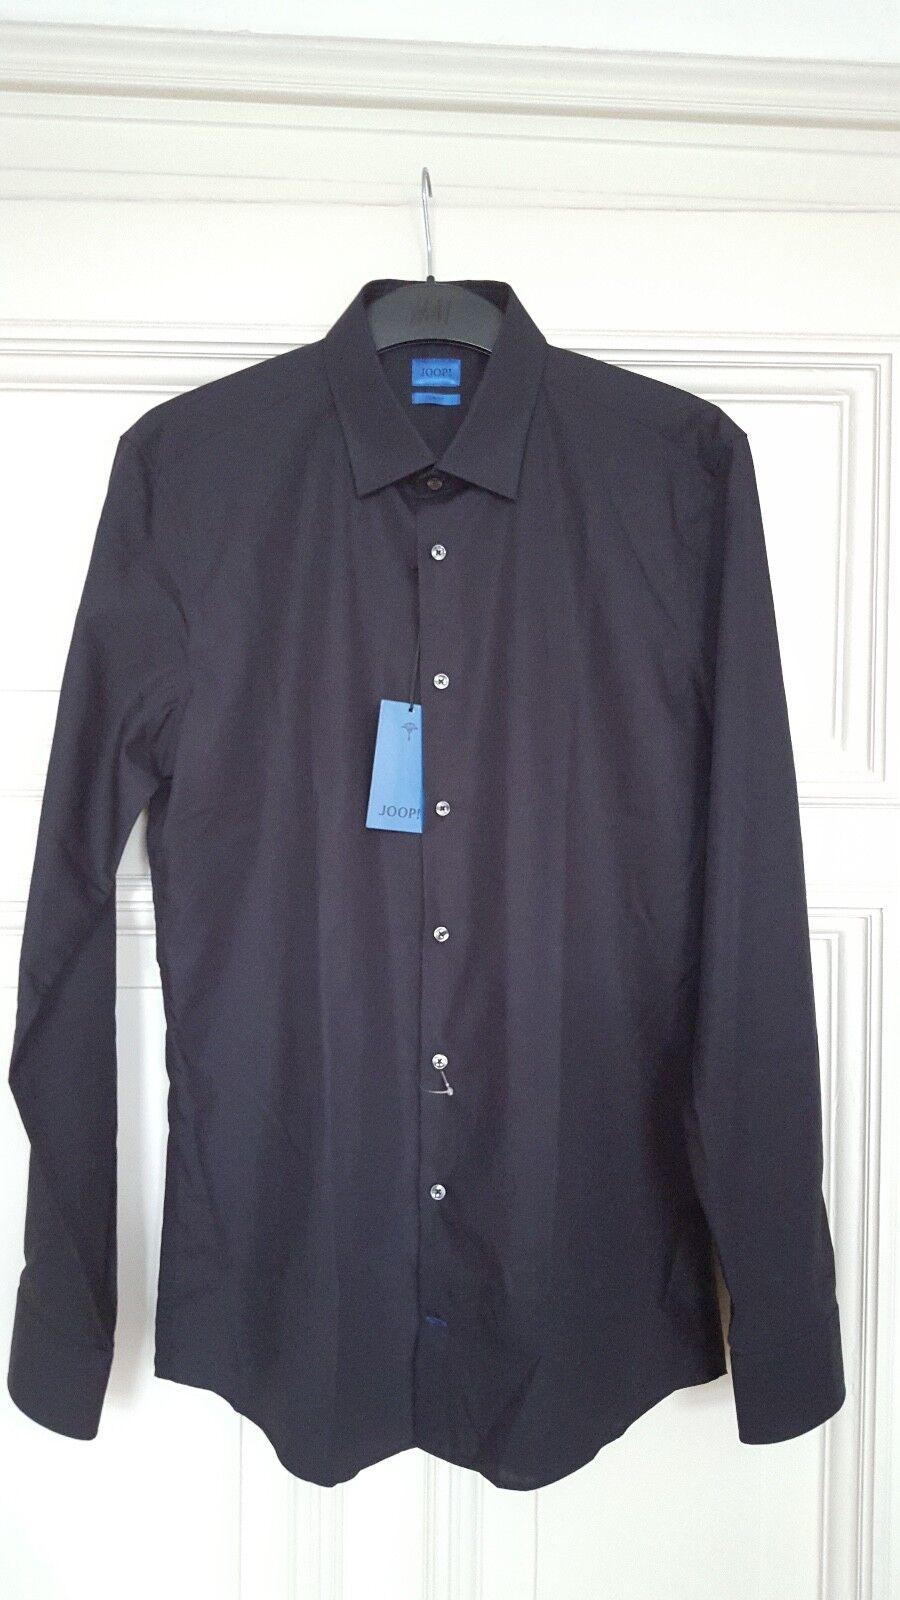 NEU JOOP  Hemd, Größe 40 Slim Fit, schwarz, langarm, Herrenhemd